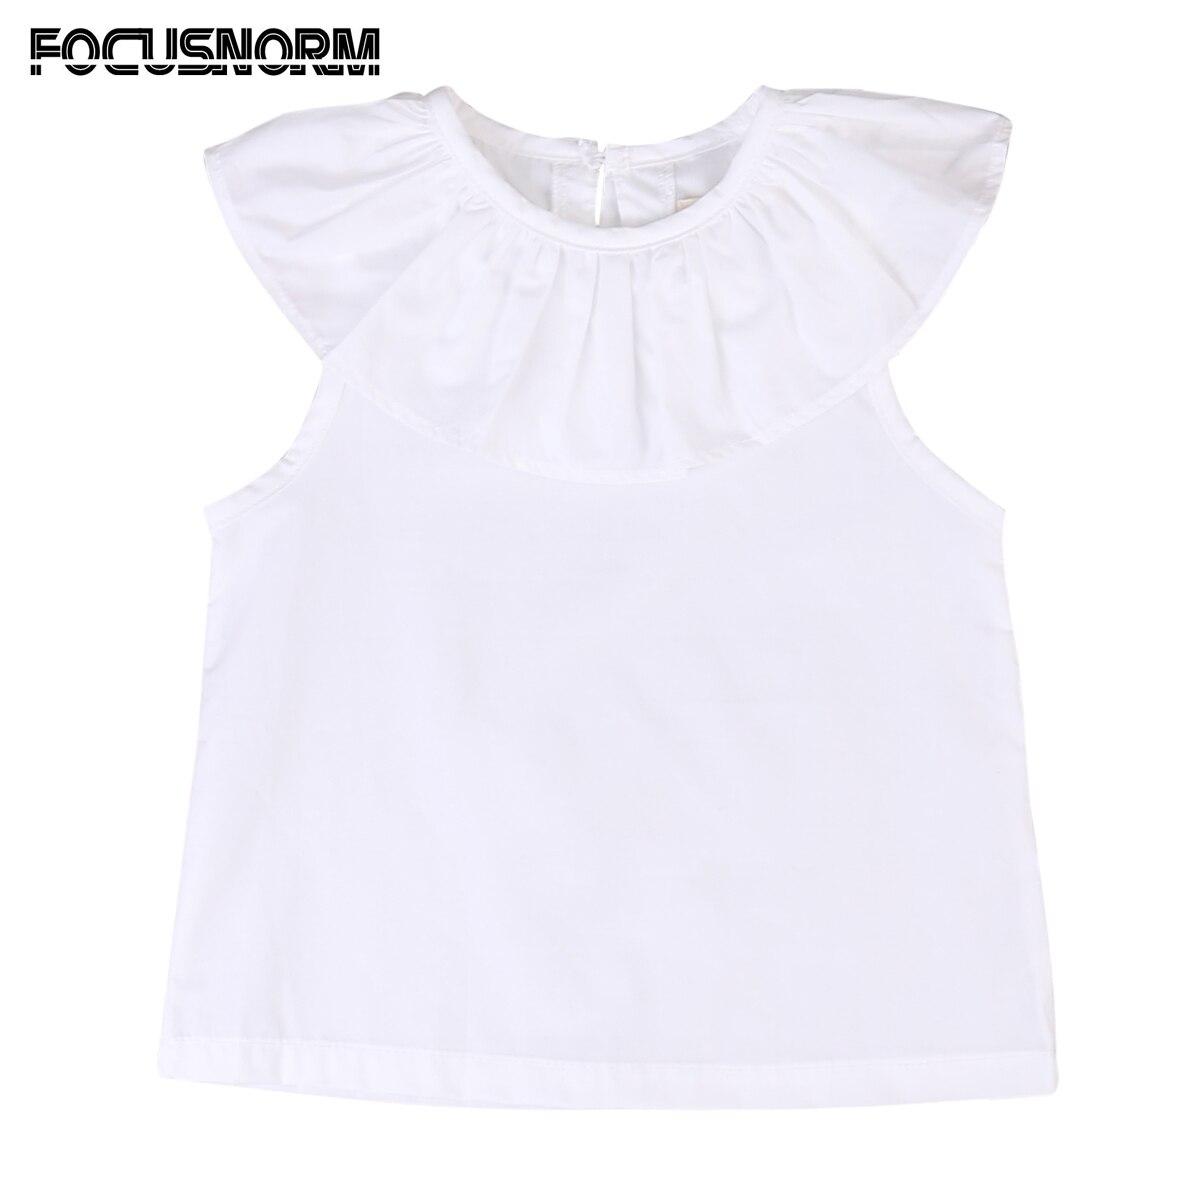 0-3y Kids Baby Meisjes Zomer Mouwloze Solid Blouse Ruche Kraag Tops Shirts Wit Baby Meisjes Kleding Producten Worden Zonder Beperkingen Verkocht